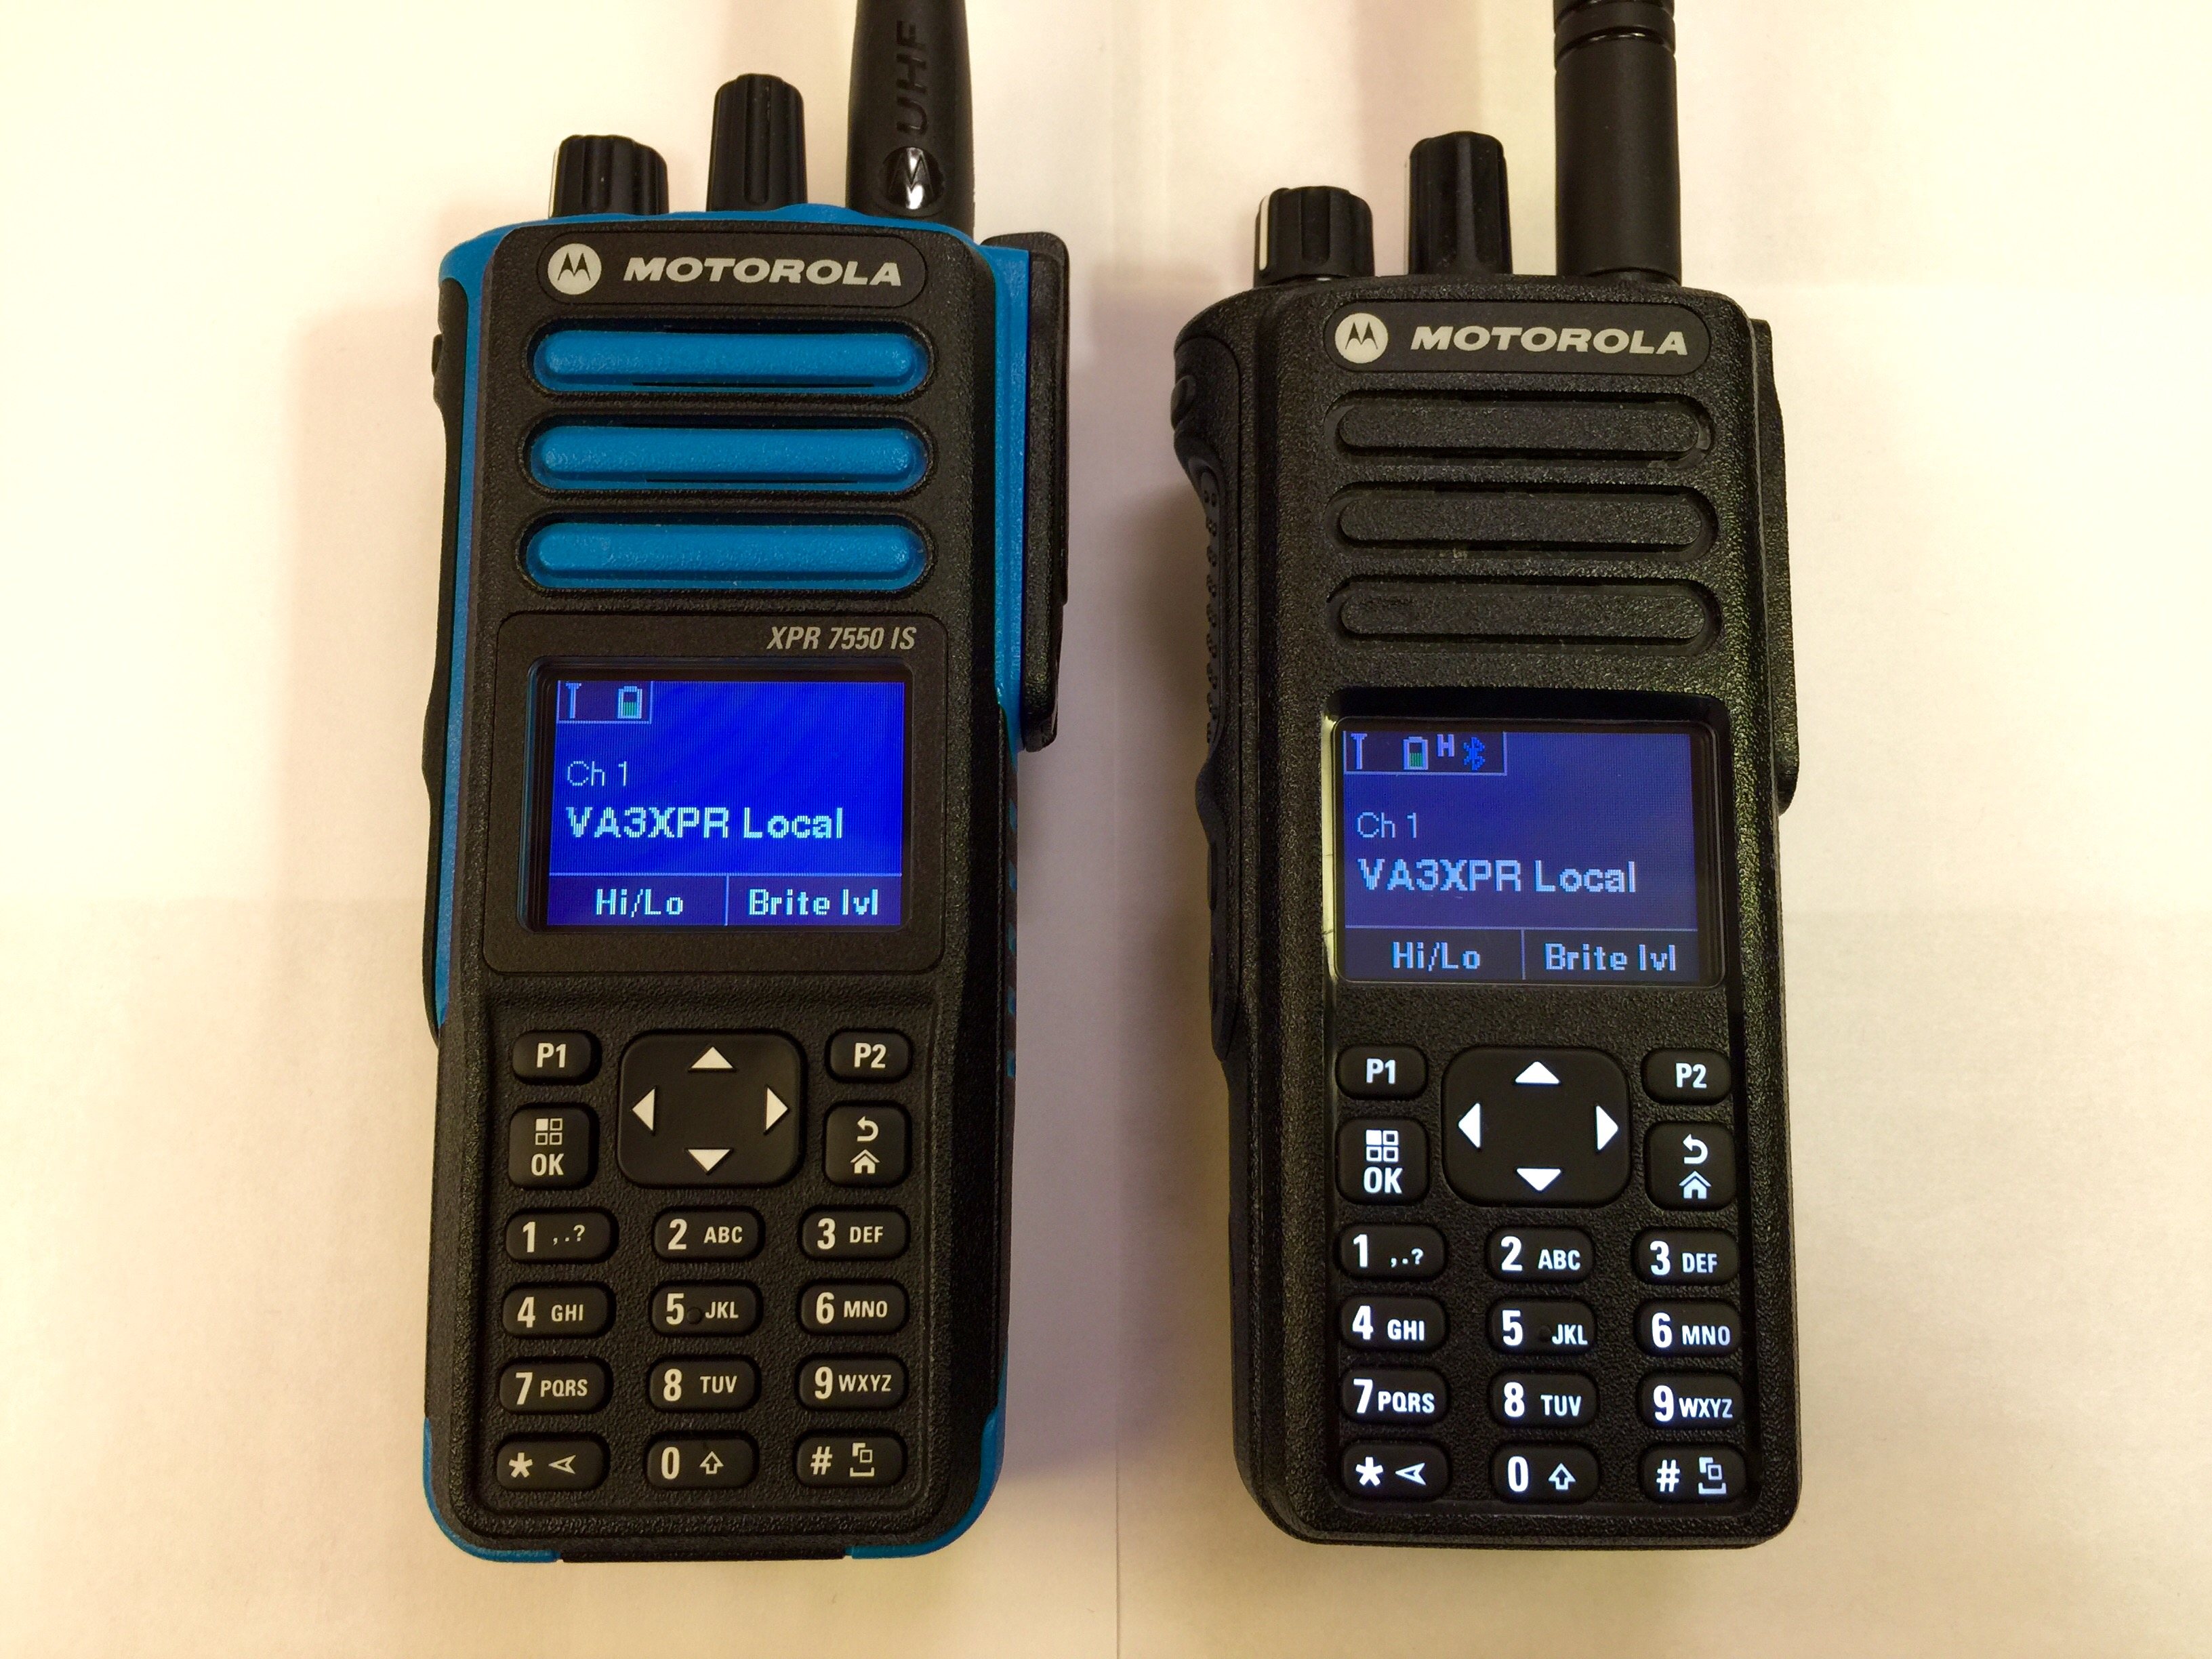 motorola xpr 6550. motorola mototrbo xpr 7550 is intrinsically safe radio ham dmr xpr 6550 1